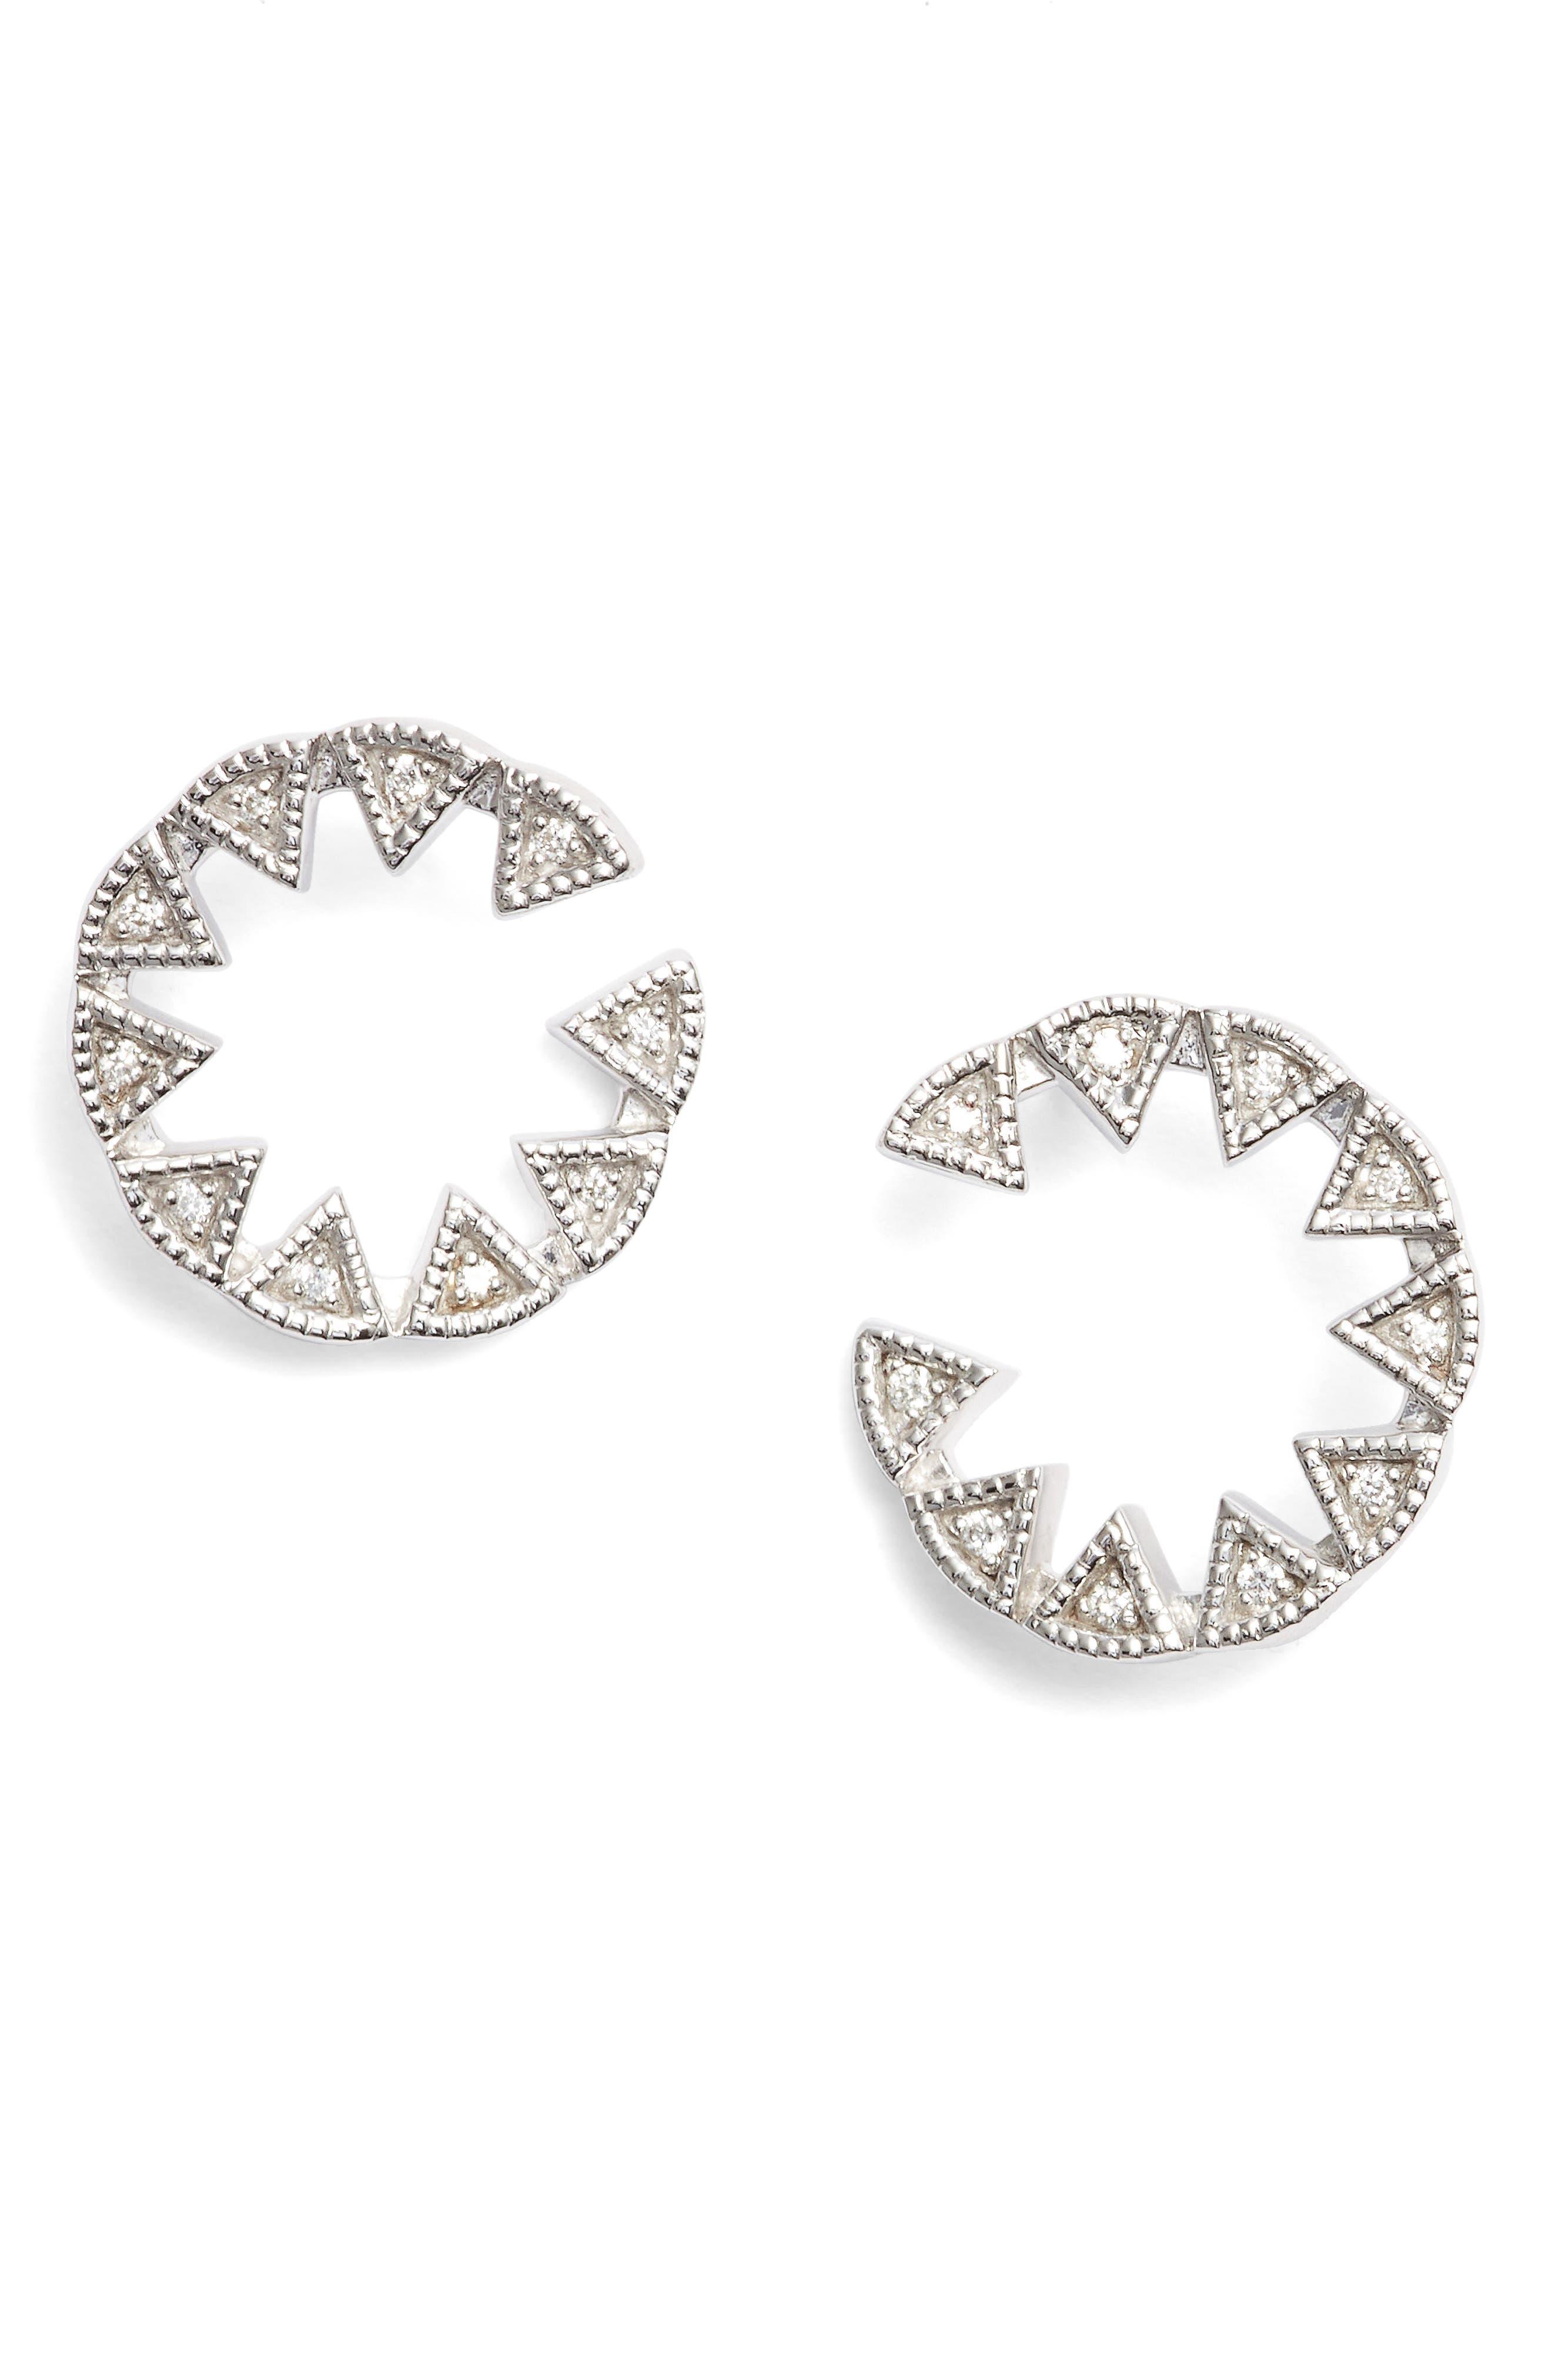 Main Image - Dana Rebecca Designs Emily Sarah Triangle Diamond Stud Earrings